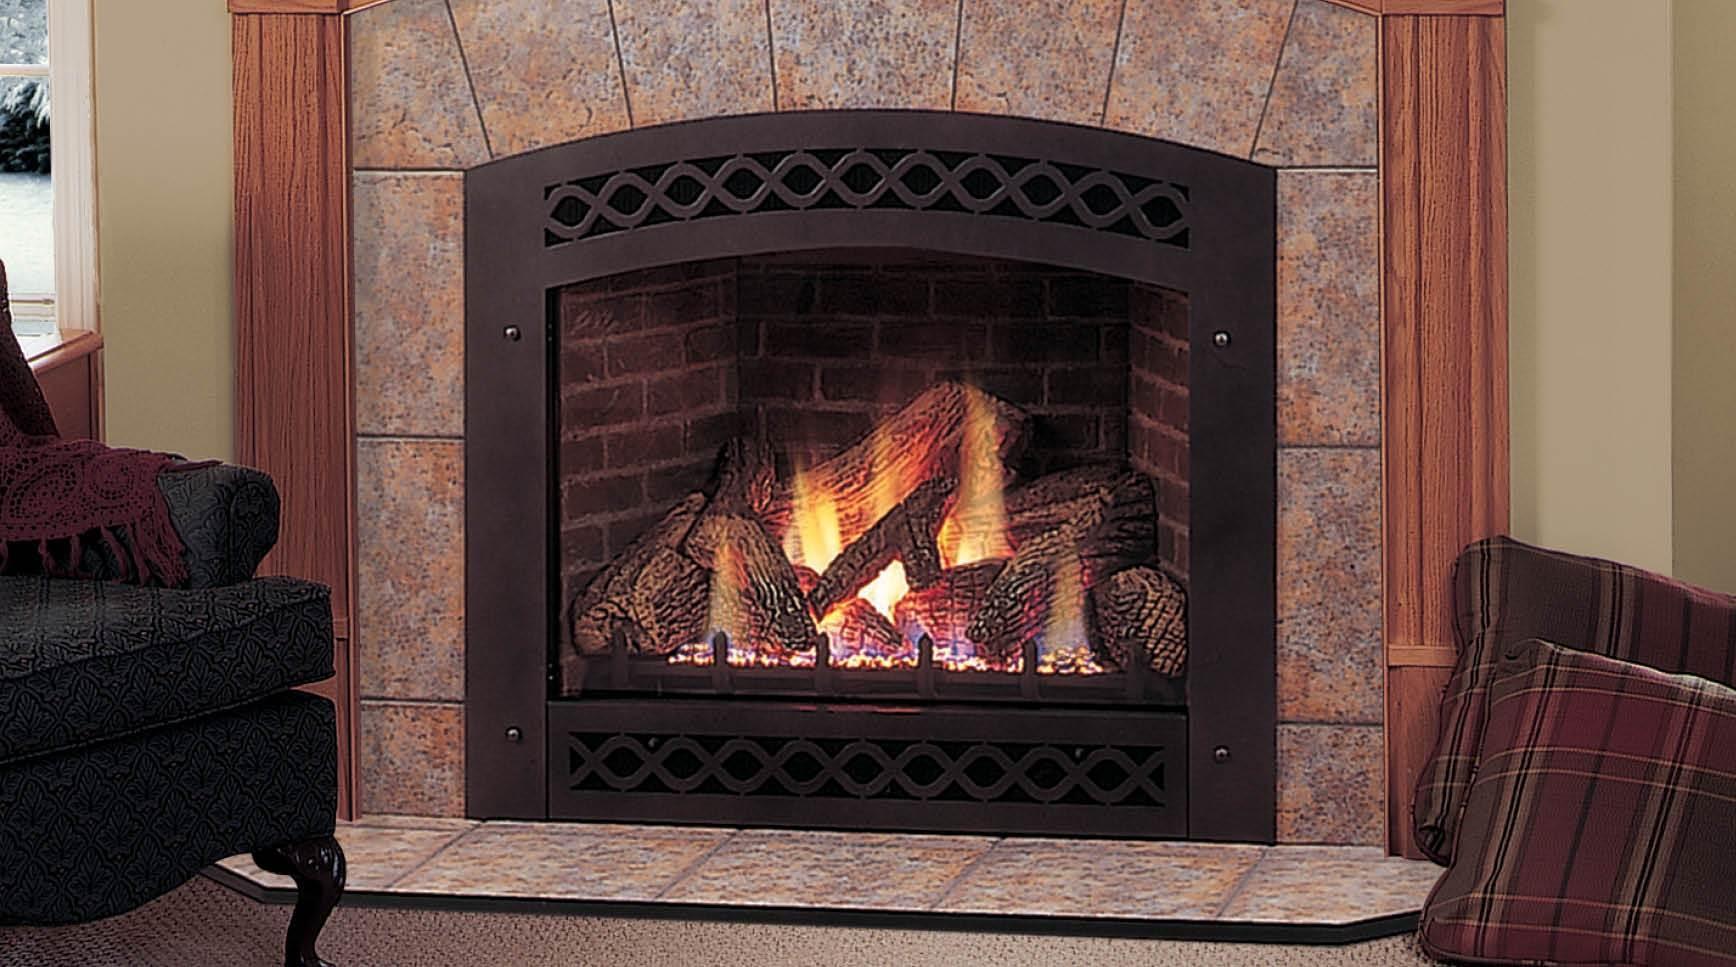 Gas Fireplace Santa Rosa Gas Fireplace Insert